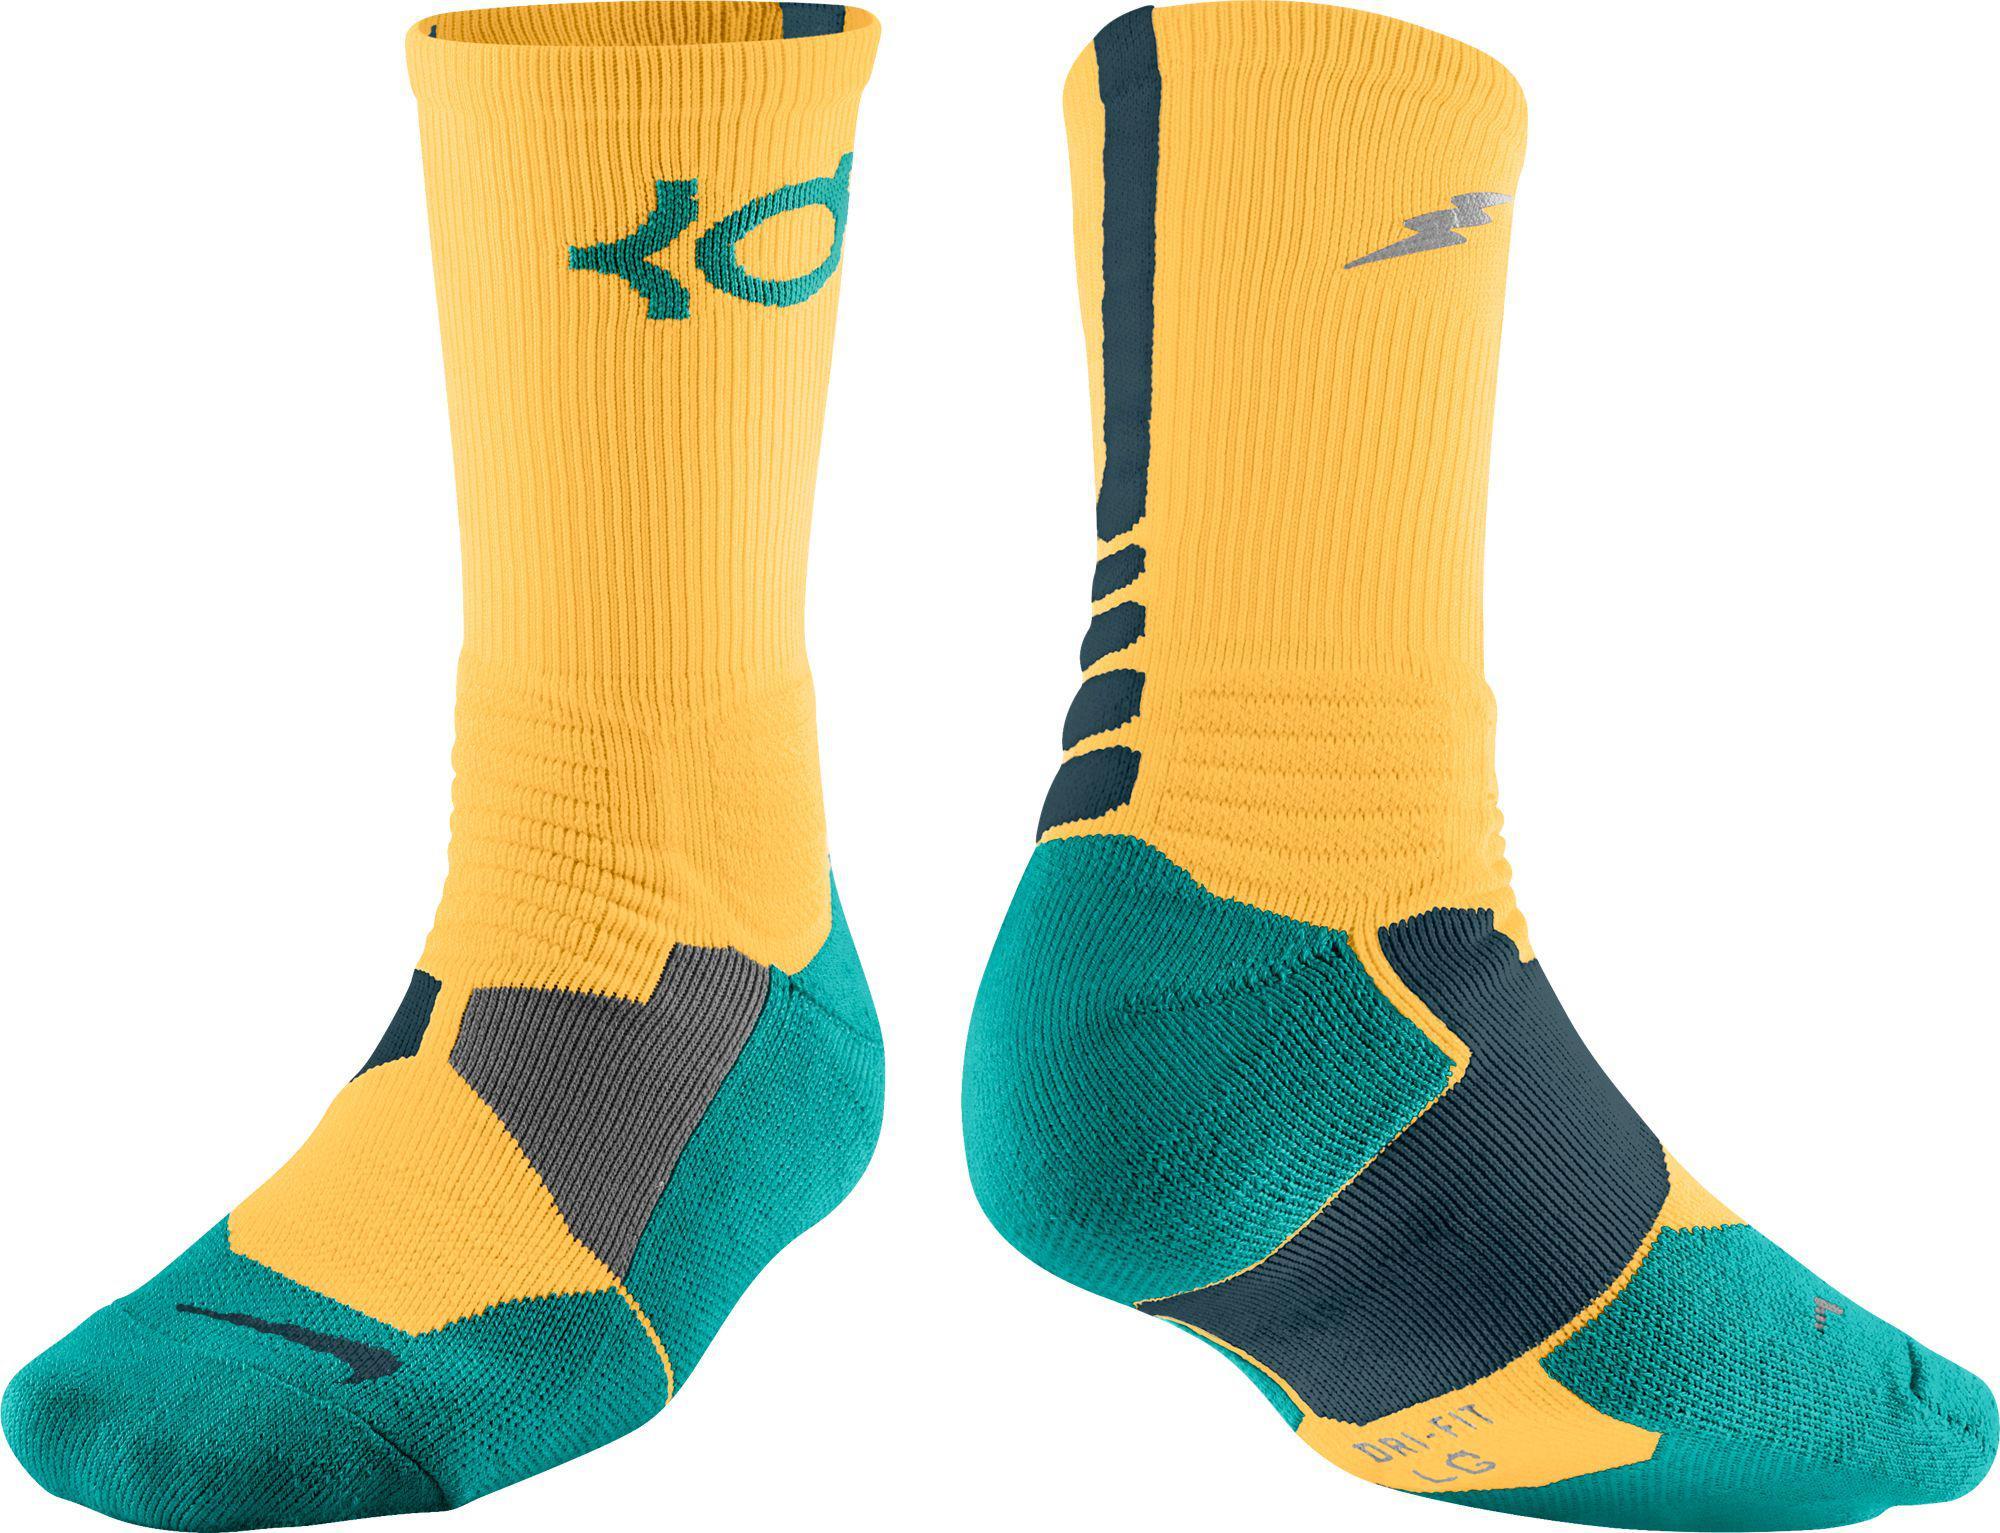 hot sale online ff0bc 8a56e Nike Orange Kd Hyper Elite Crew Basketball Socks Jpeg. S Lyst Clothing  Nicole Miller Sleeveless Ruched Fl